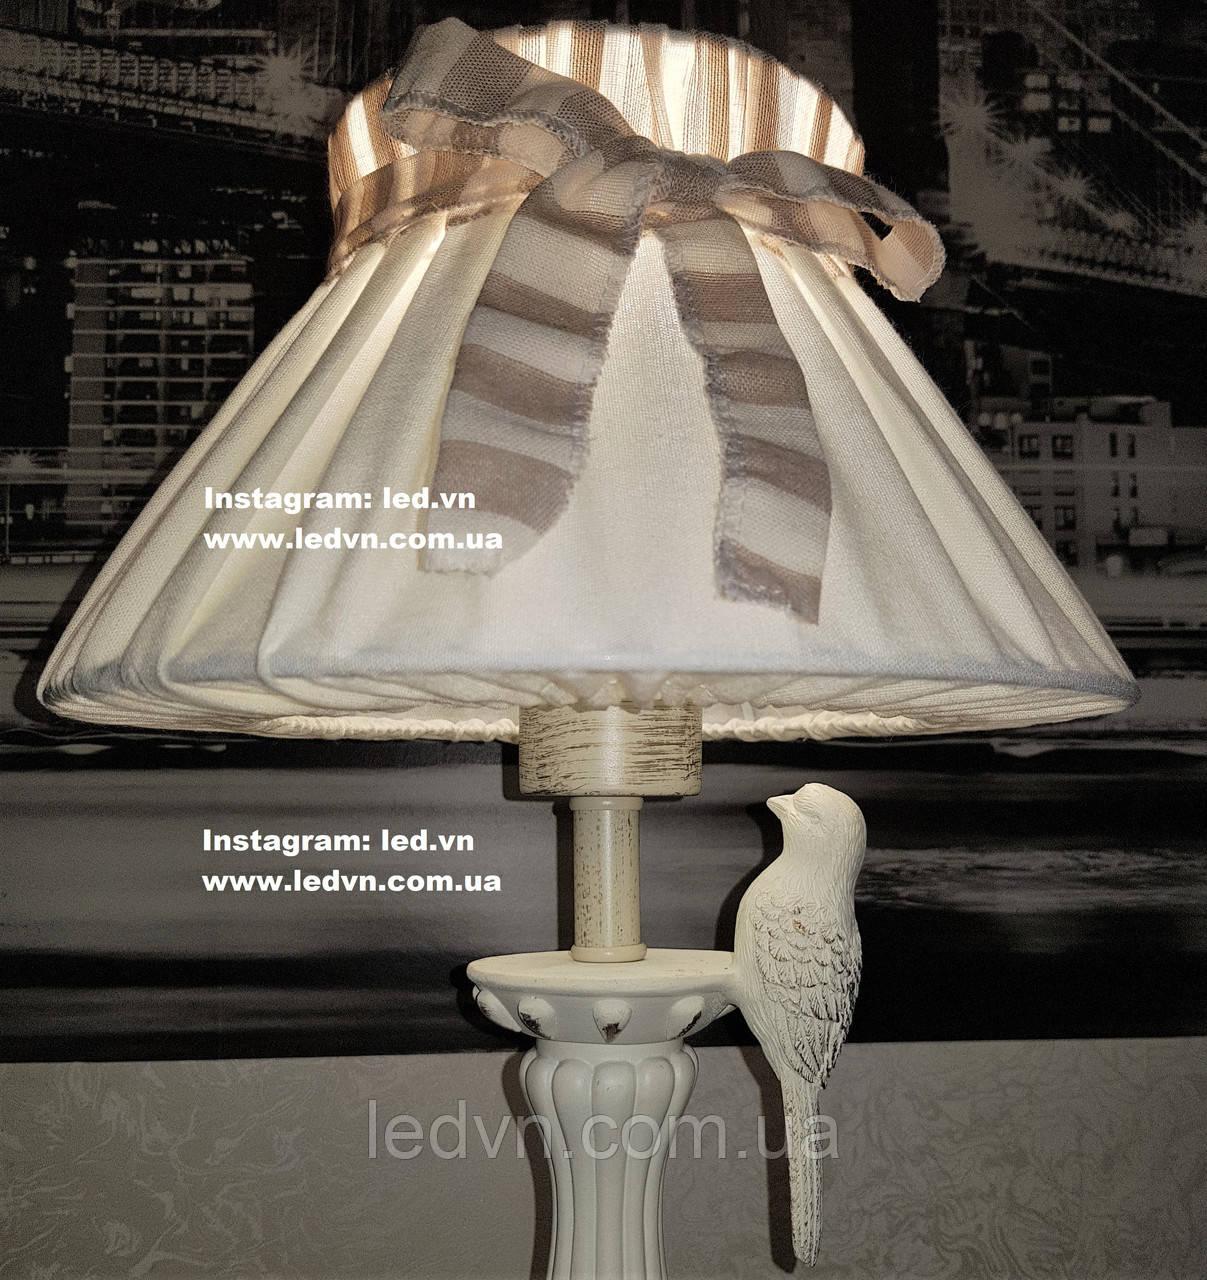 стеклянная настольная лампа купить